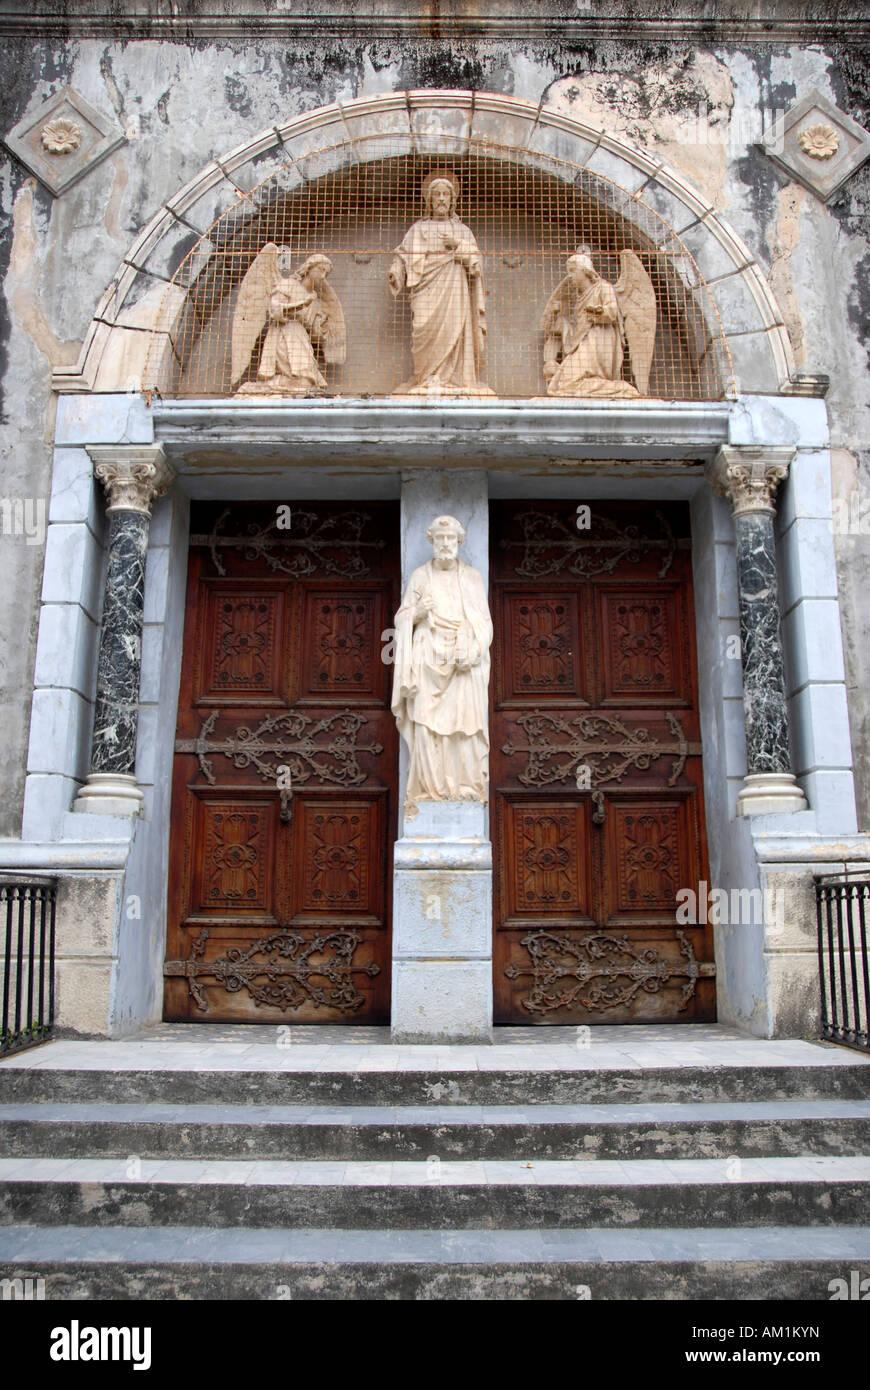 Entrance to catholic St Joseph's Cathedral Stone Town Zanzibar Tanzania Stock Photo